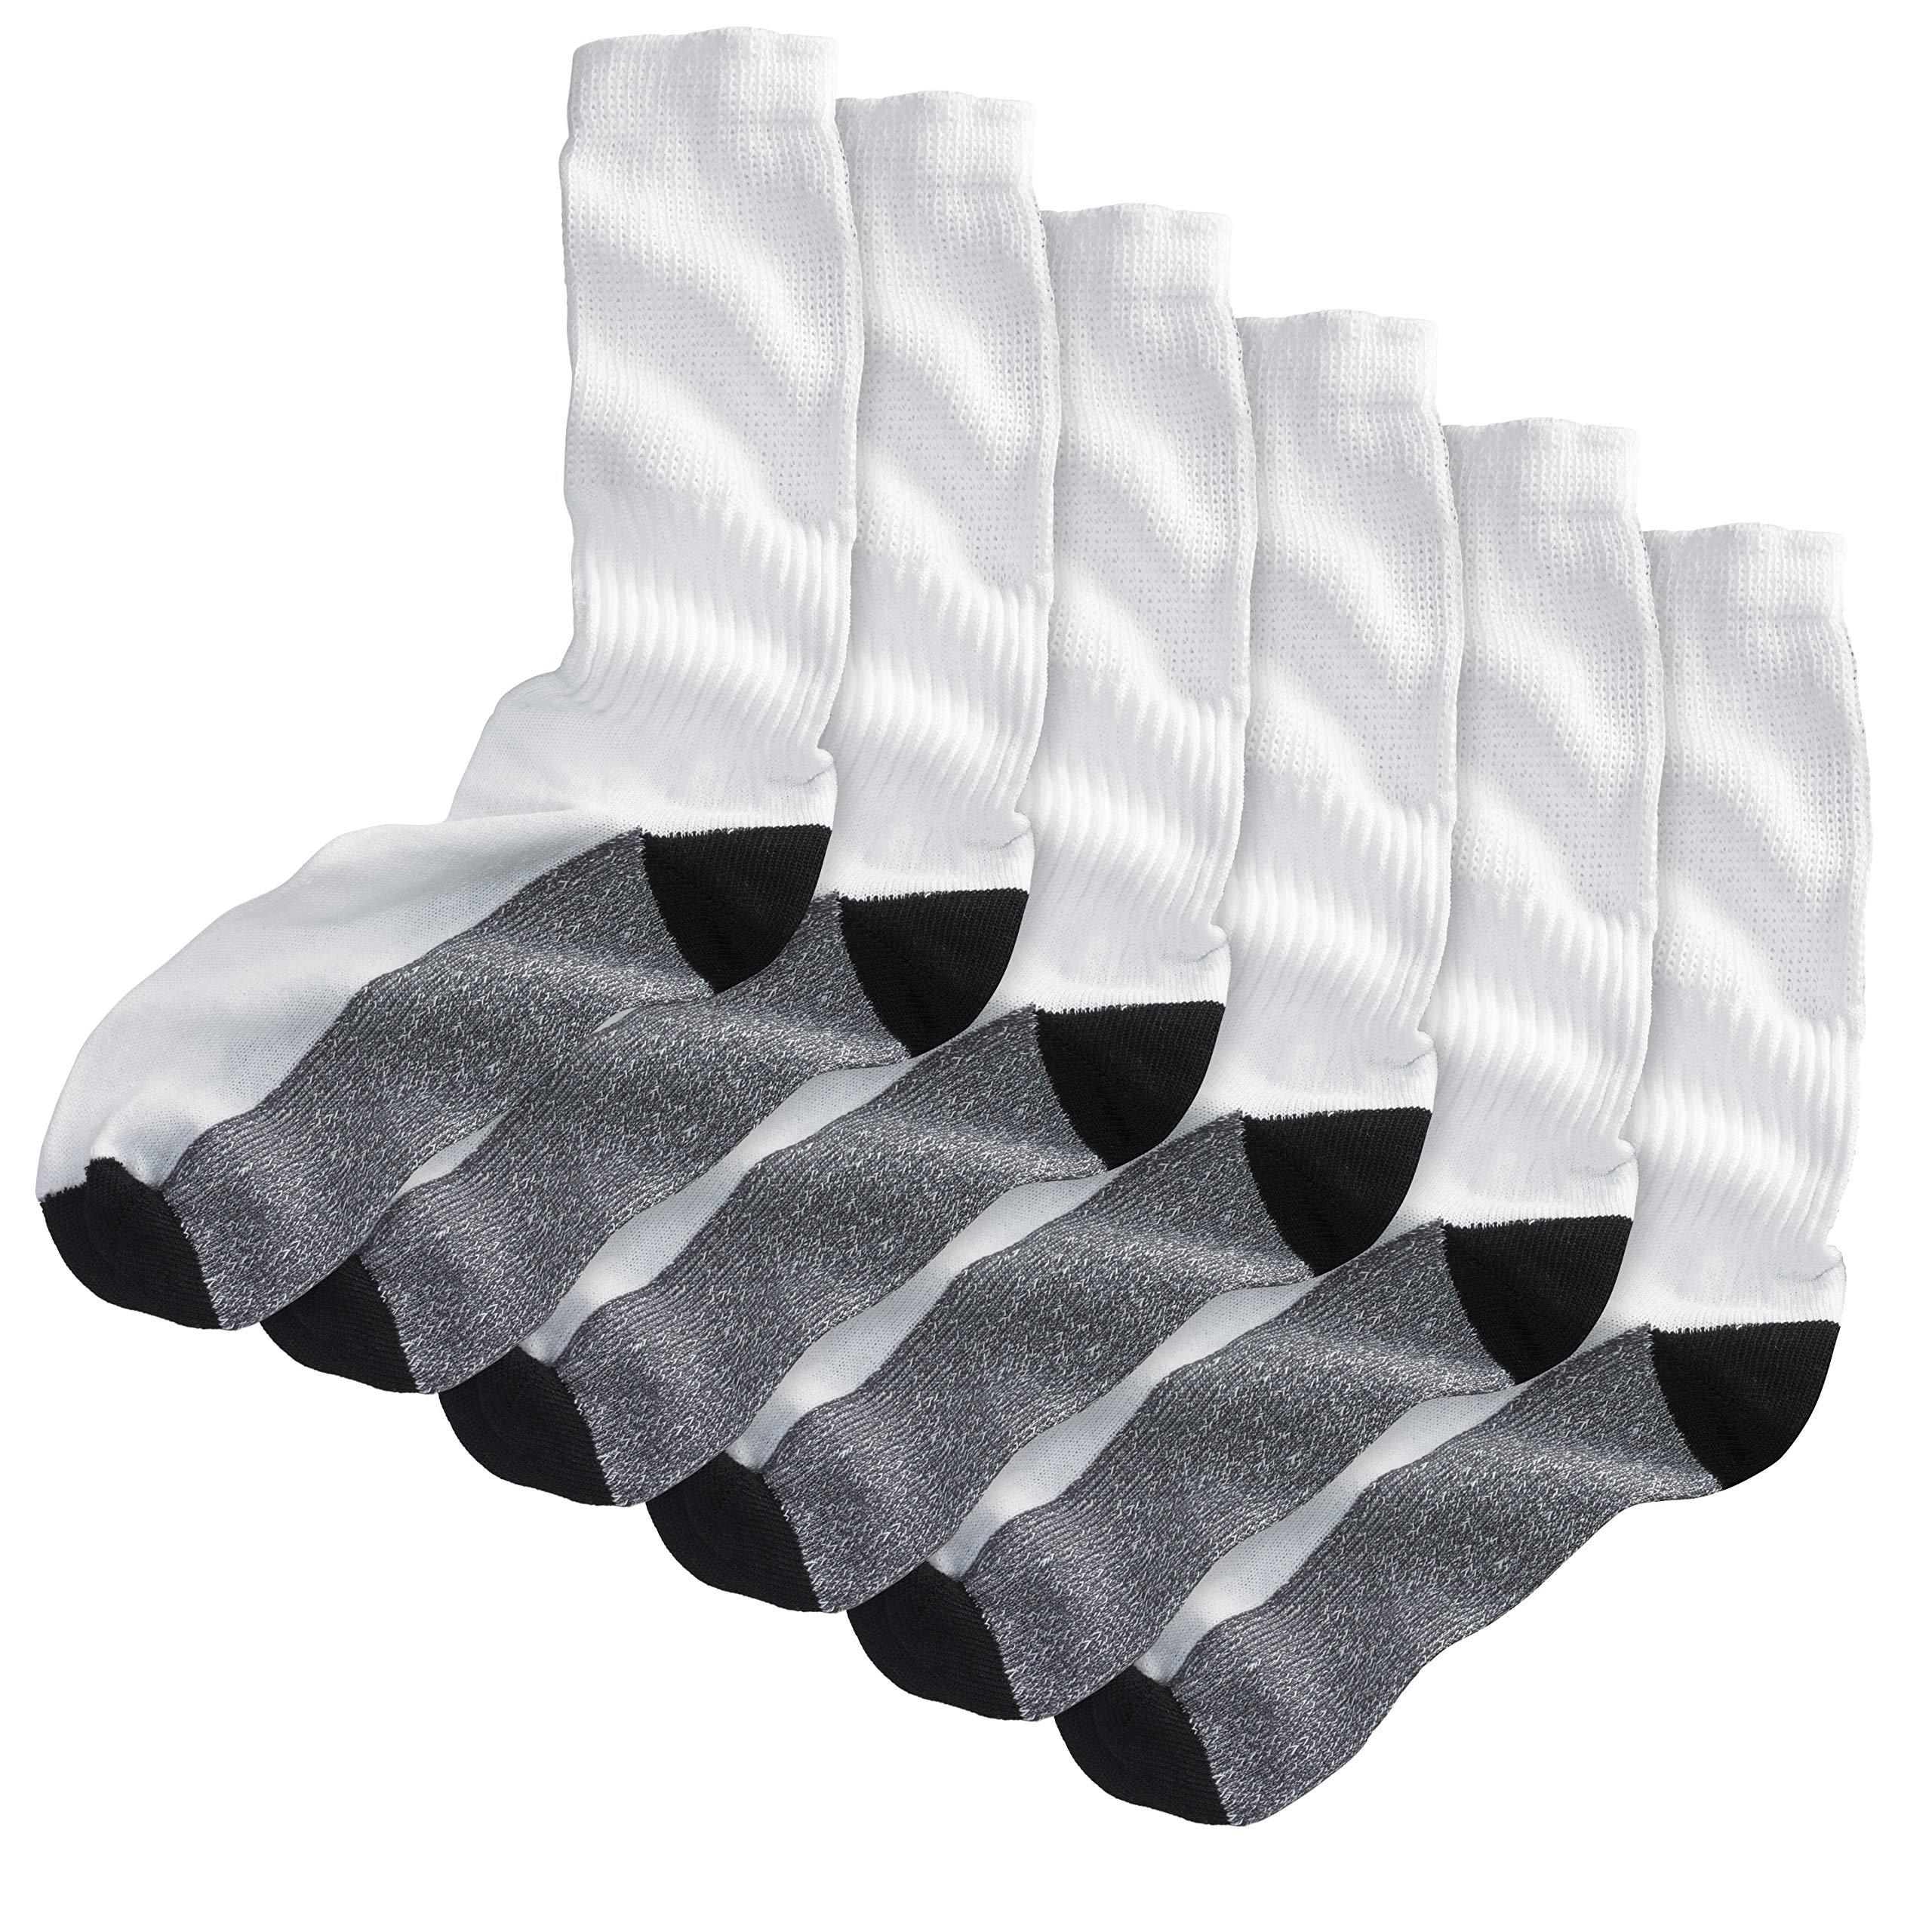 Kingsize Men's Big & Tall 3-Pack Full Length Cushioned Crew Socks, Black Big-L